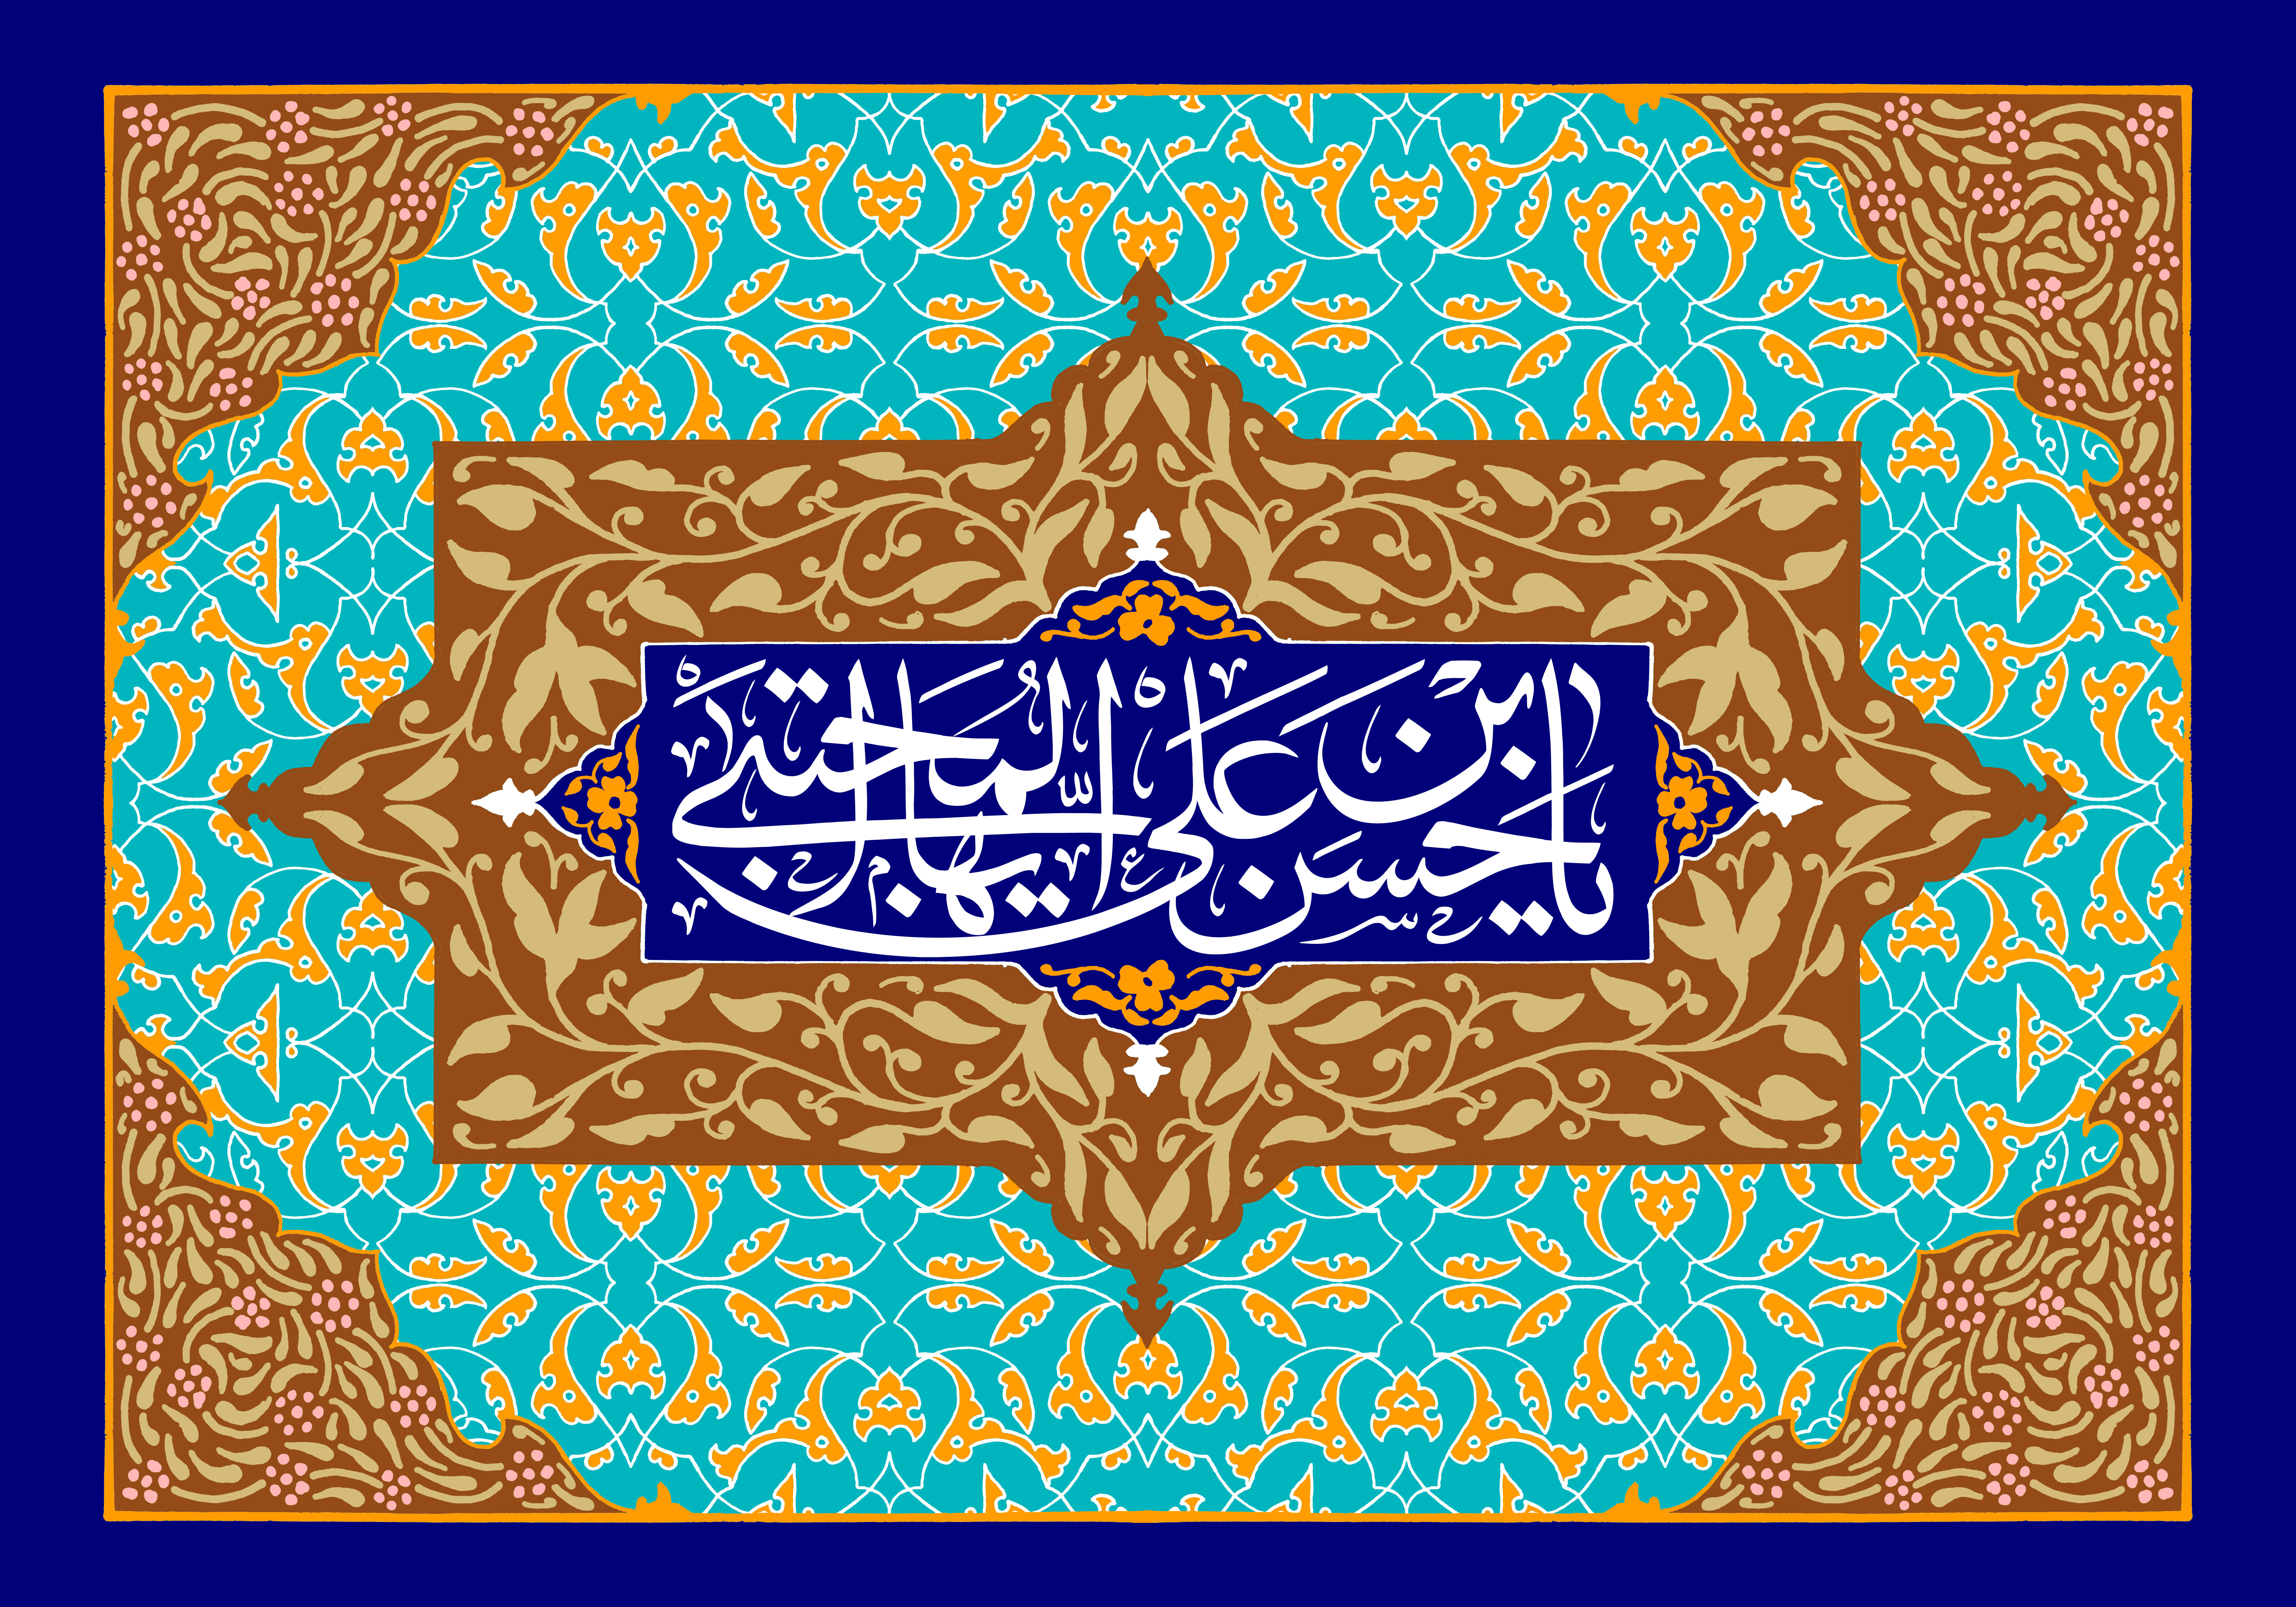 پوستر ولادت امام حسن مجتبی (ع)